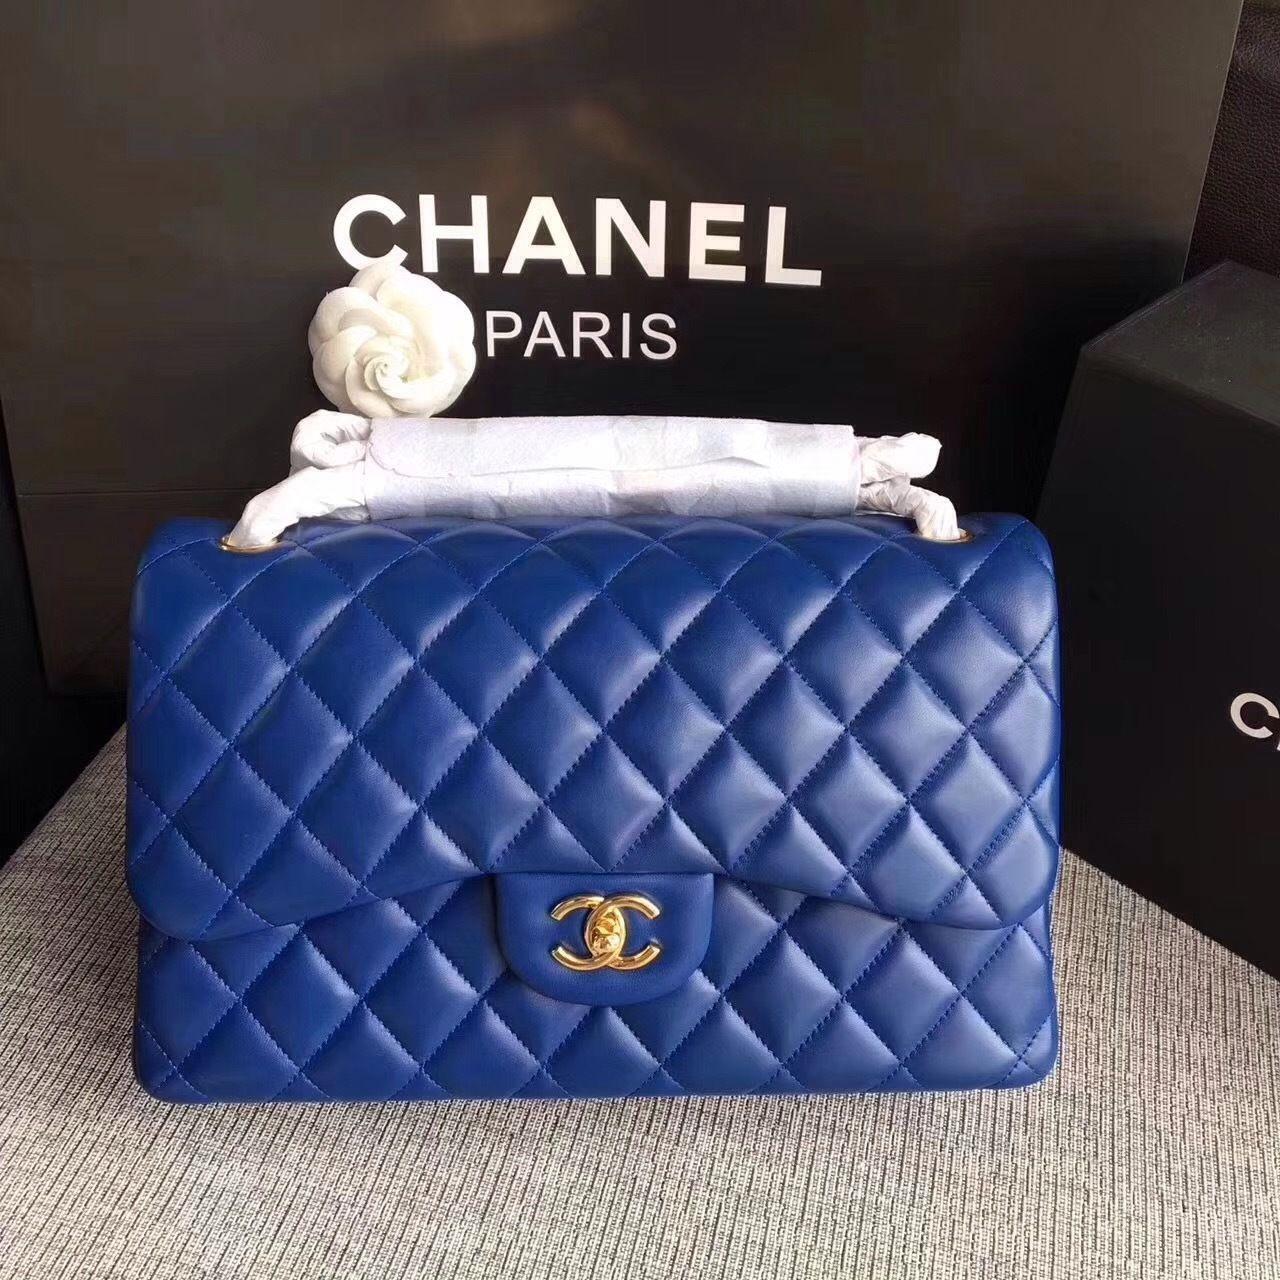 94ff03cba3c9b2 Chanel LARGE CLASSIC HANDBAG Blue Lambskin - Bella Vita Moda #chanel  #chanelbag #chanellover